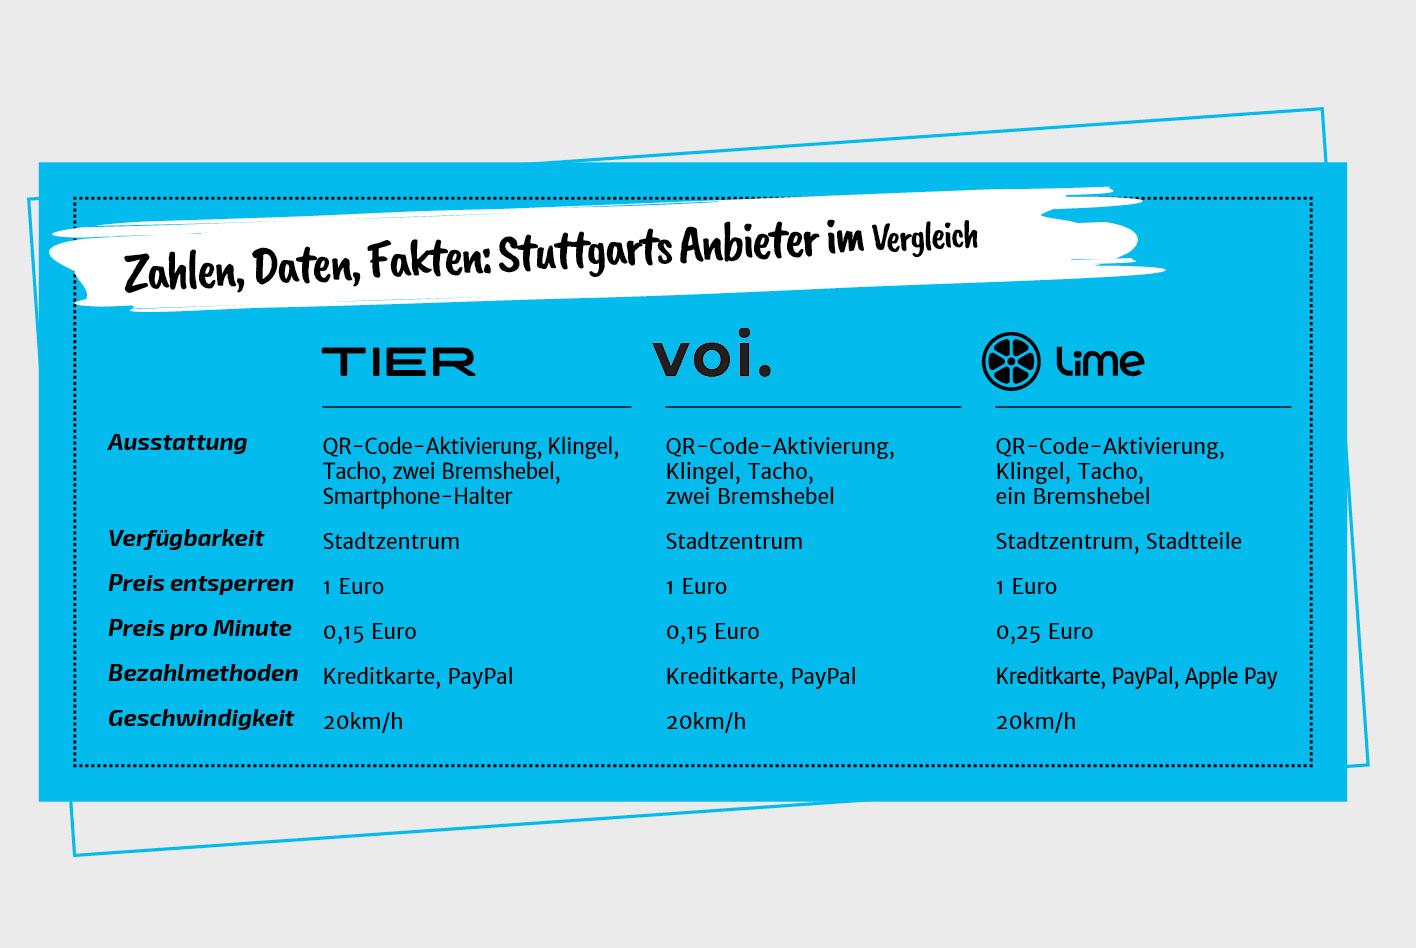 Zahlen, Daten, Fakten: Stuttgarts E-Scooter-Anbieter im Vergleich.